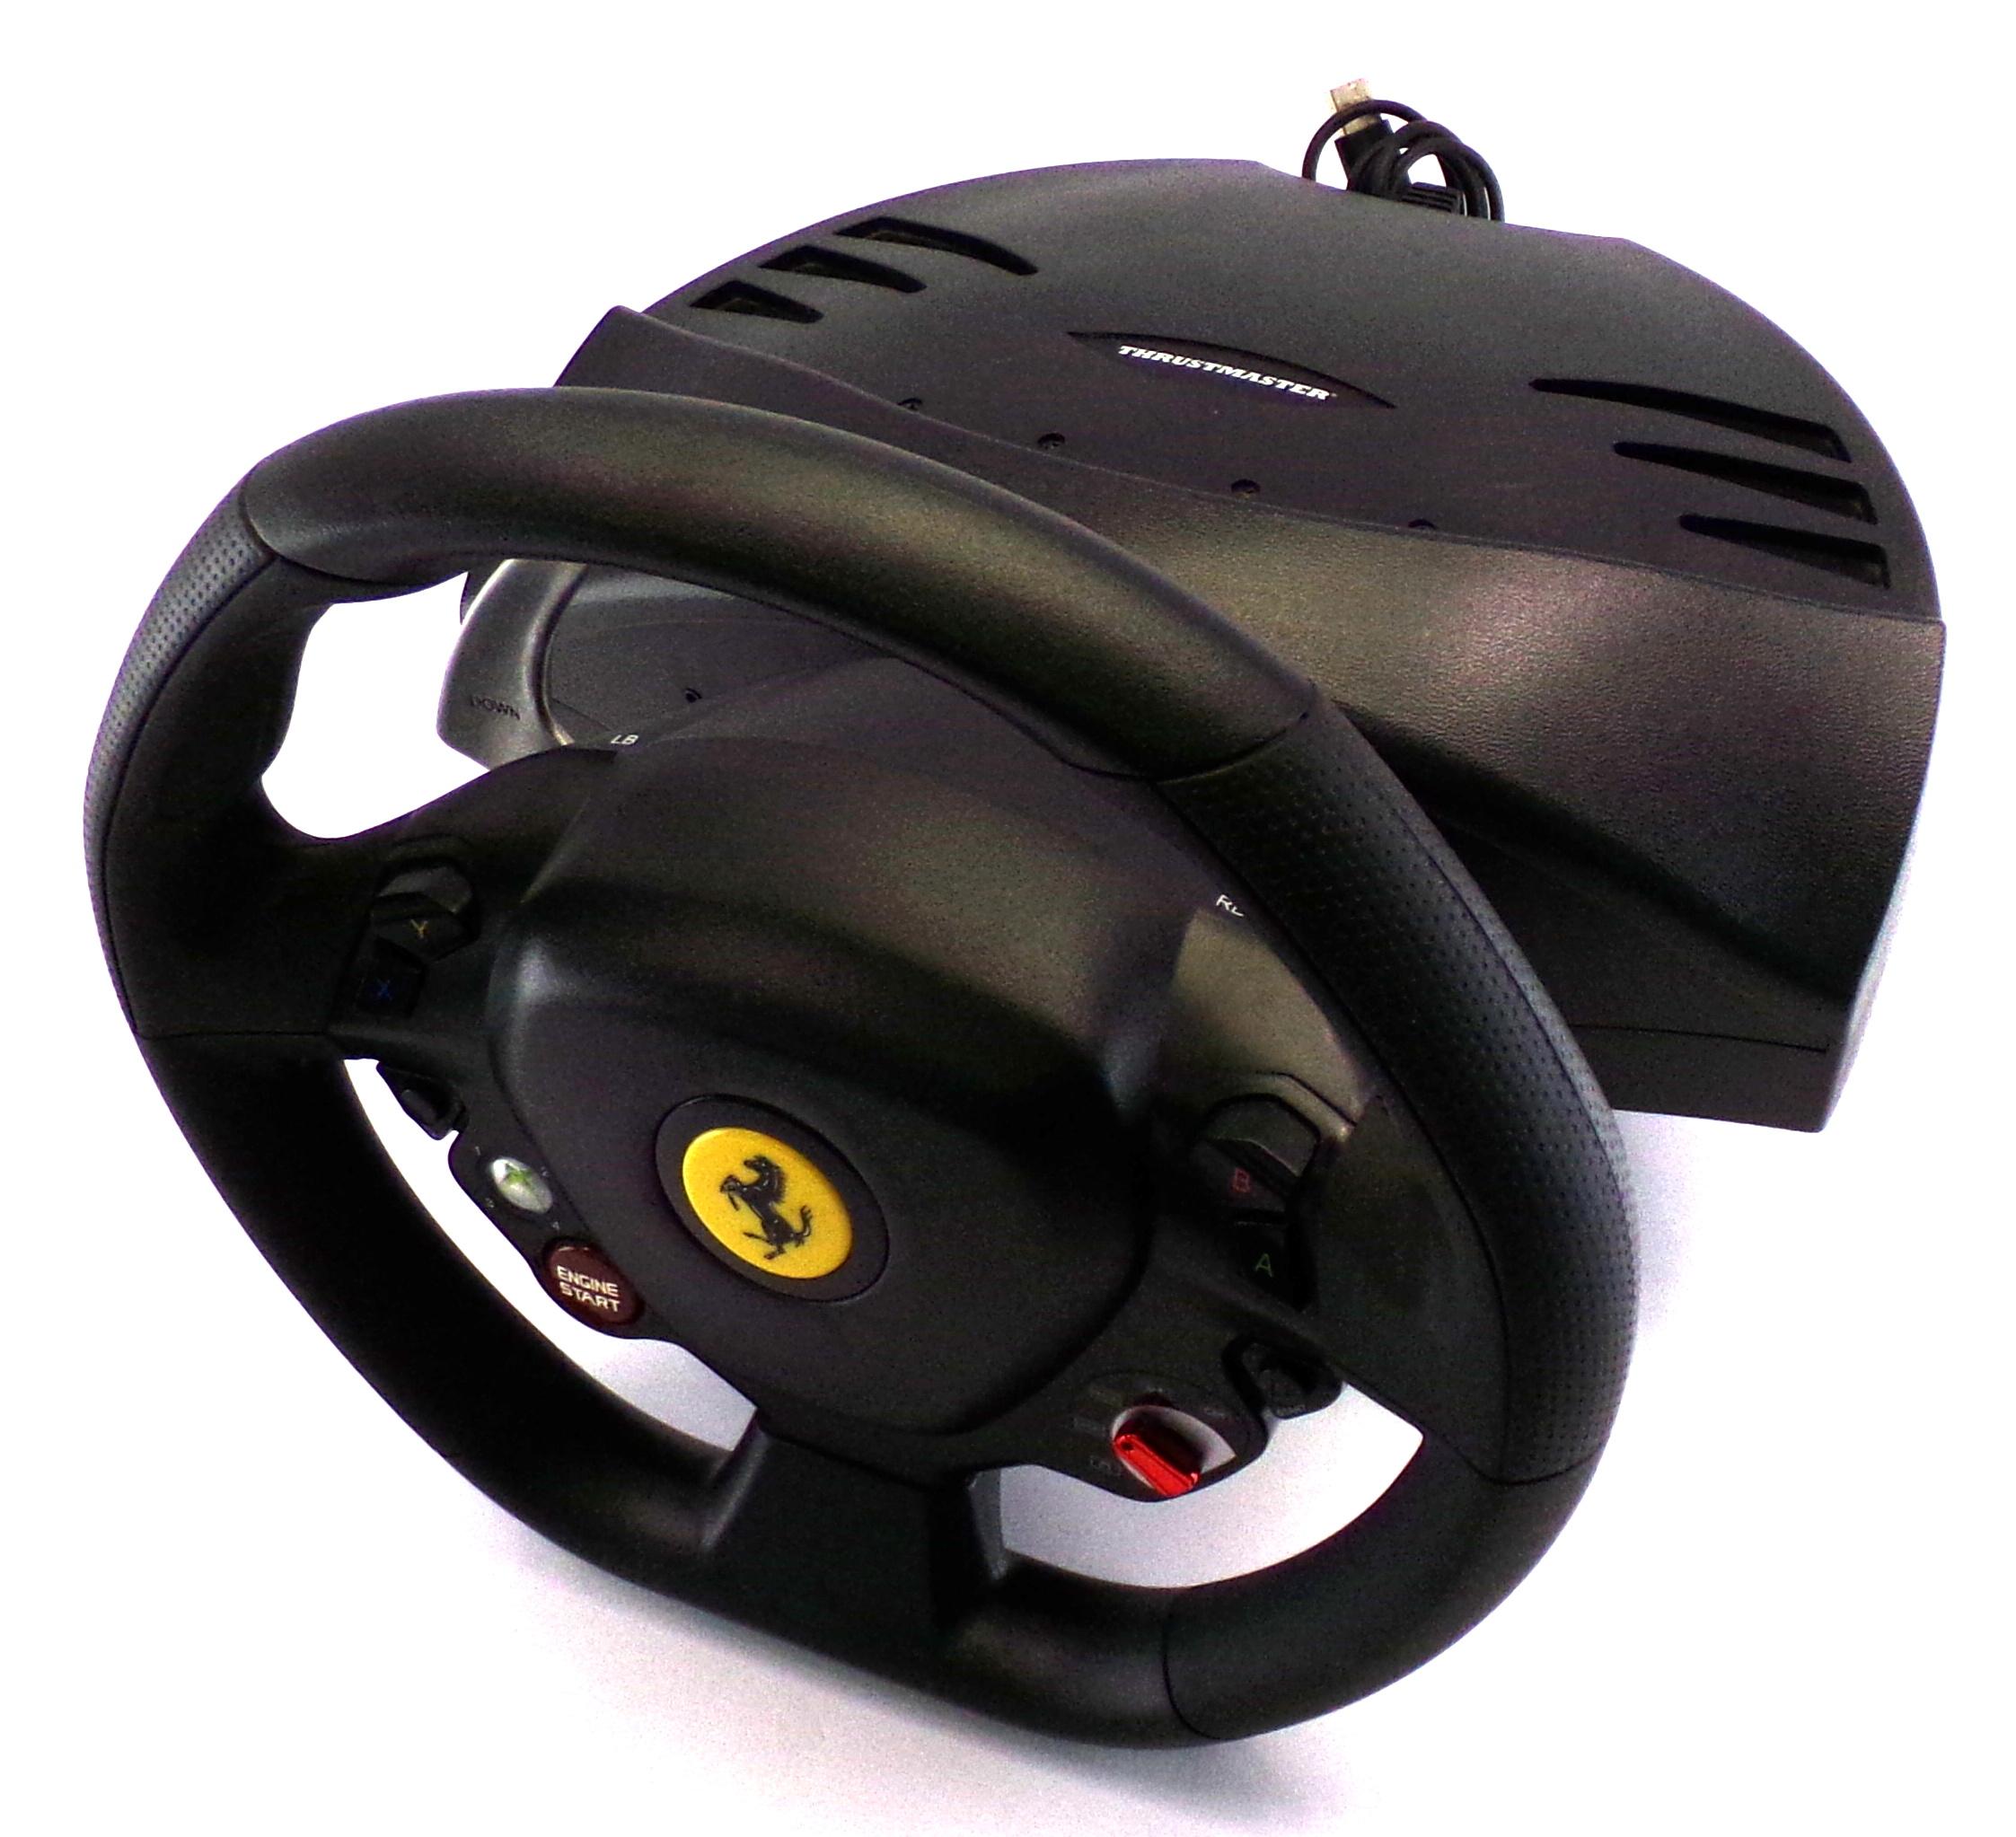 Thrustmaster Ferrari 458 RW Xbox 360 V.4 Steering Wheel - No Pedals